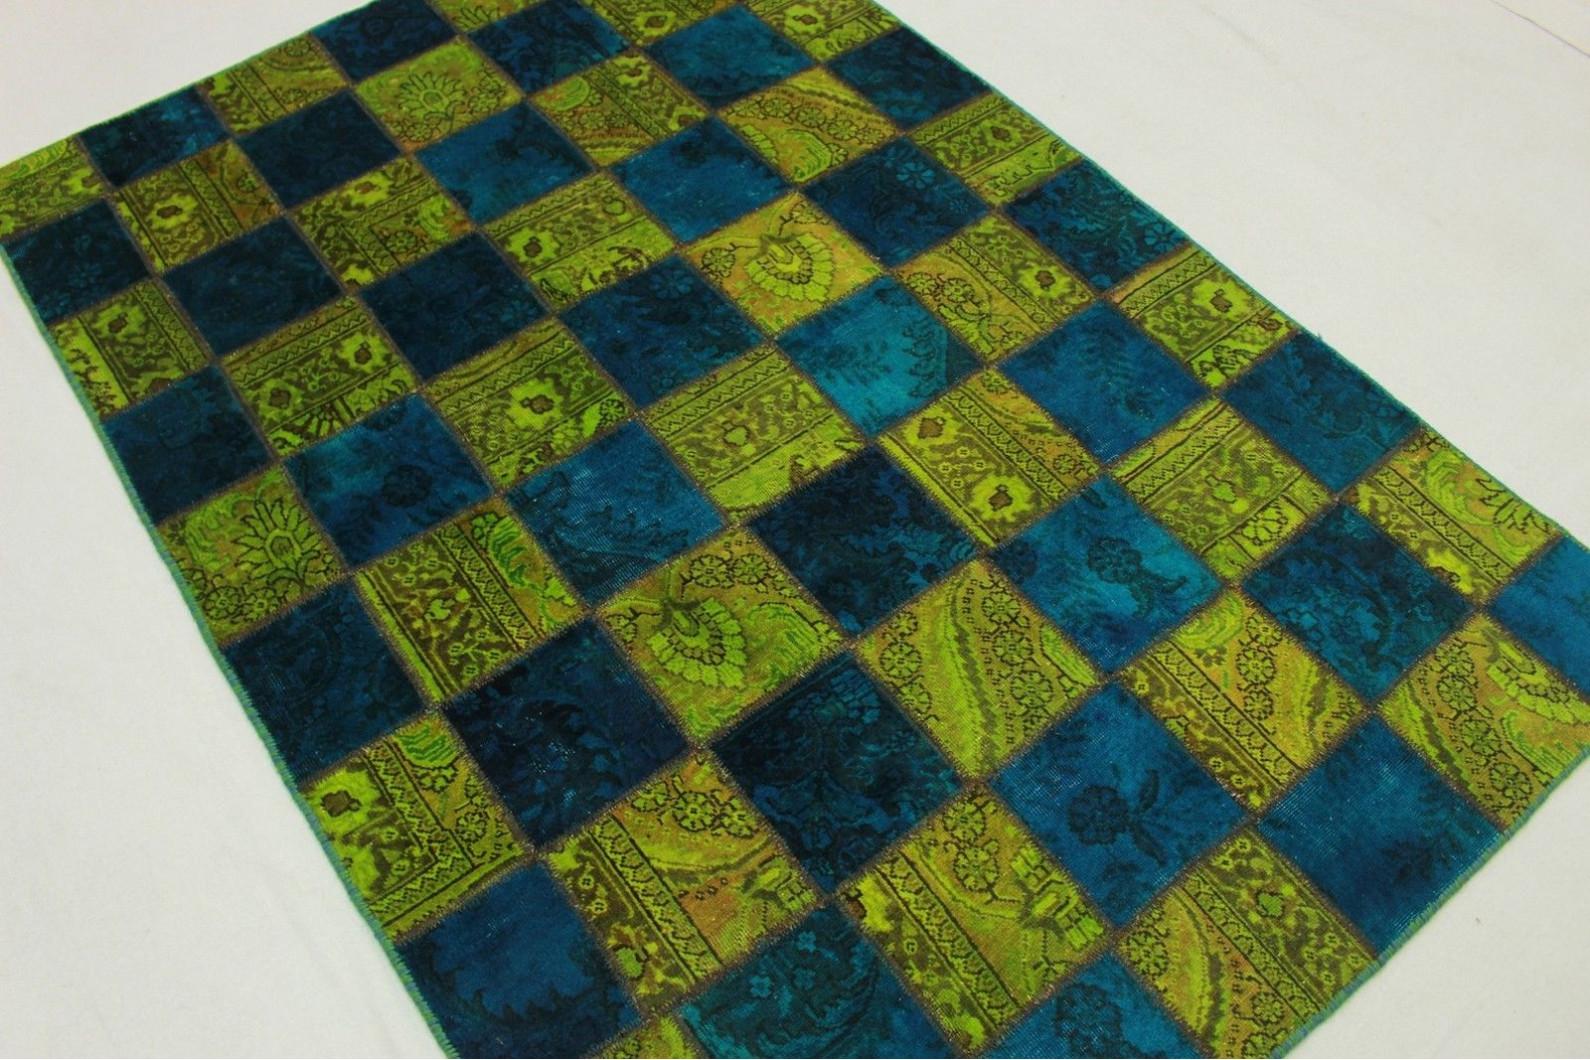 Teppich grün blau  Patchwork Teppich Grün Blau in 200x140cm (1001-1972) bei carpetido ...